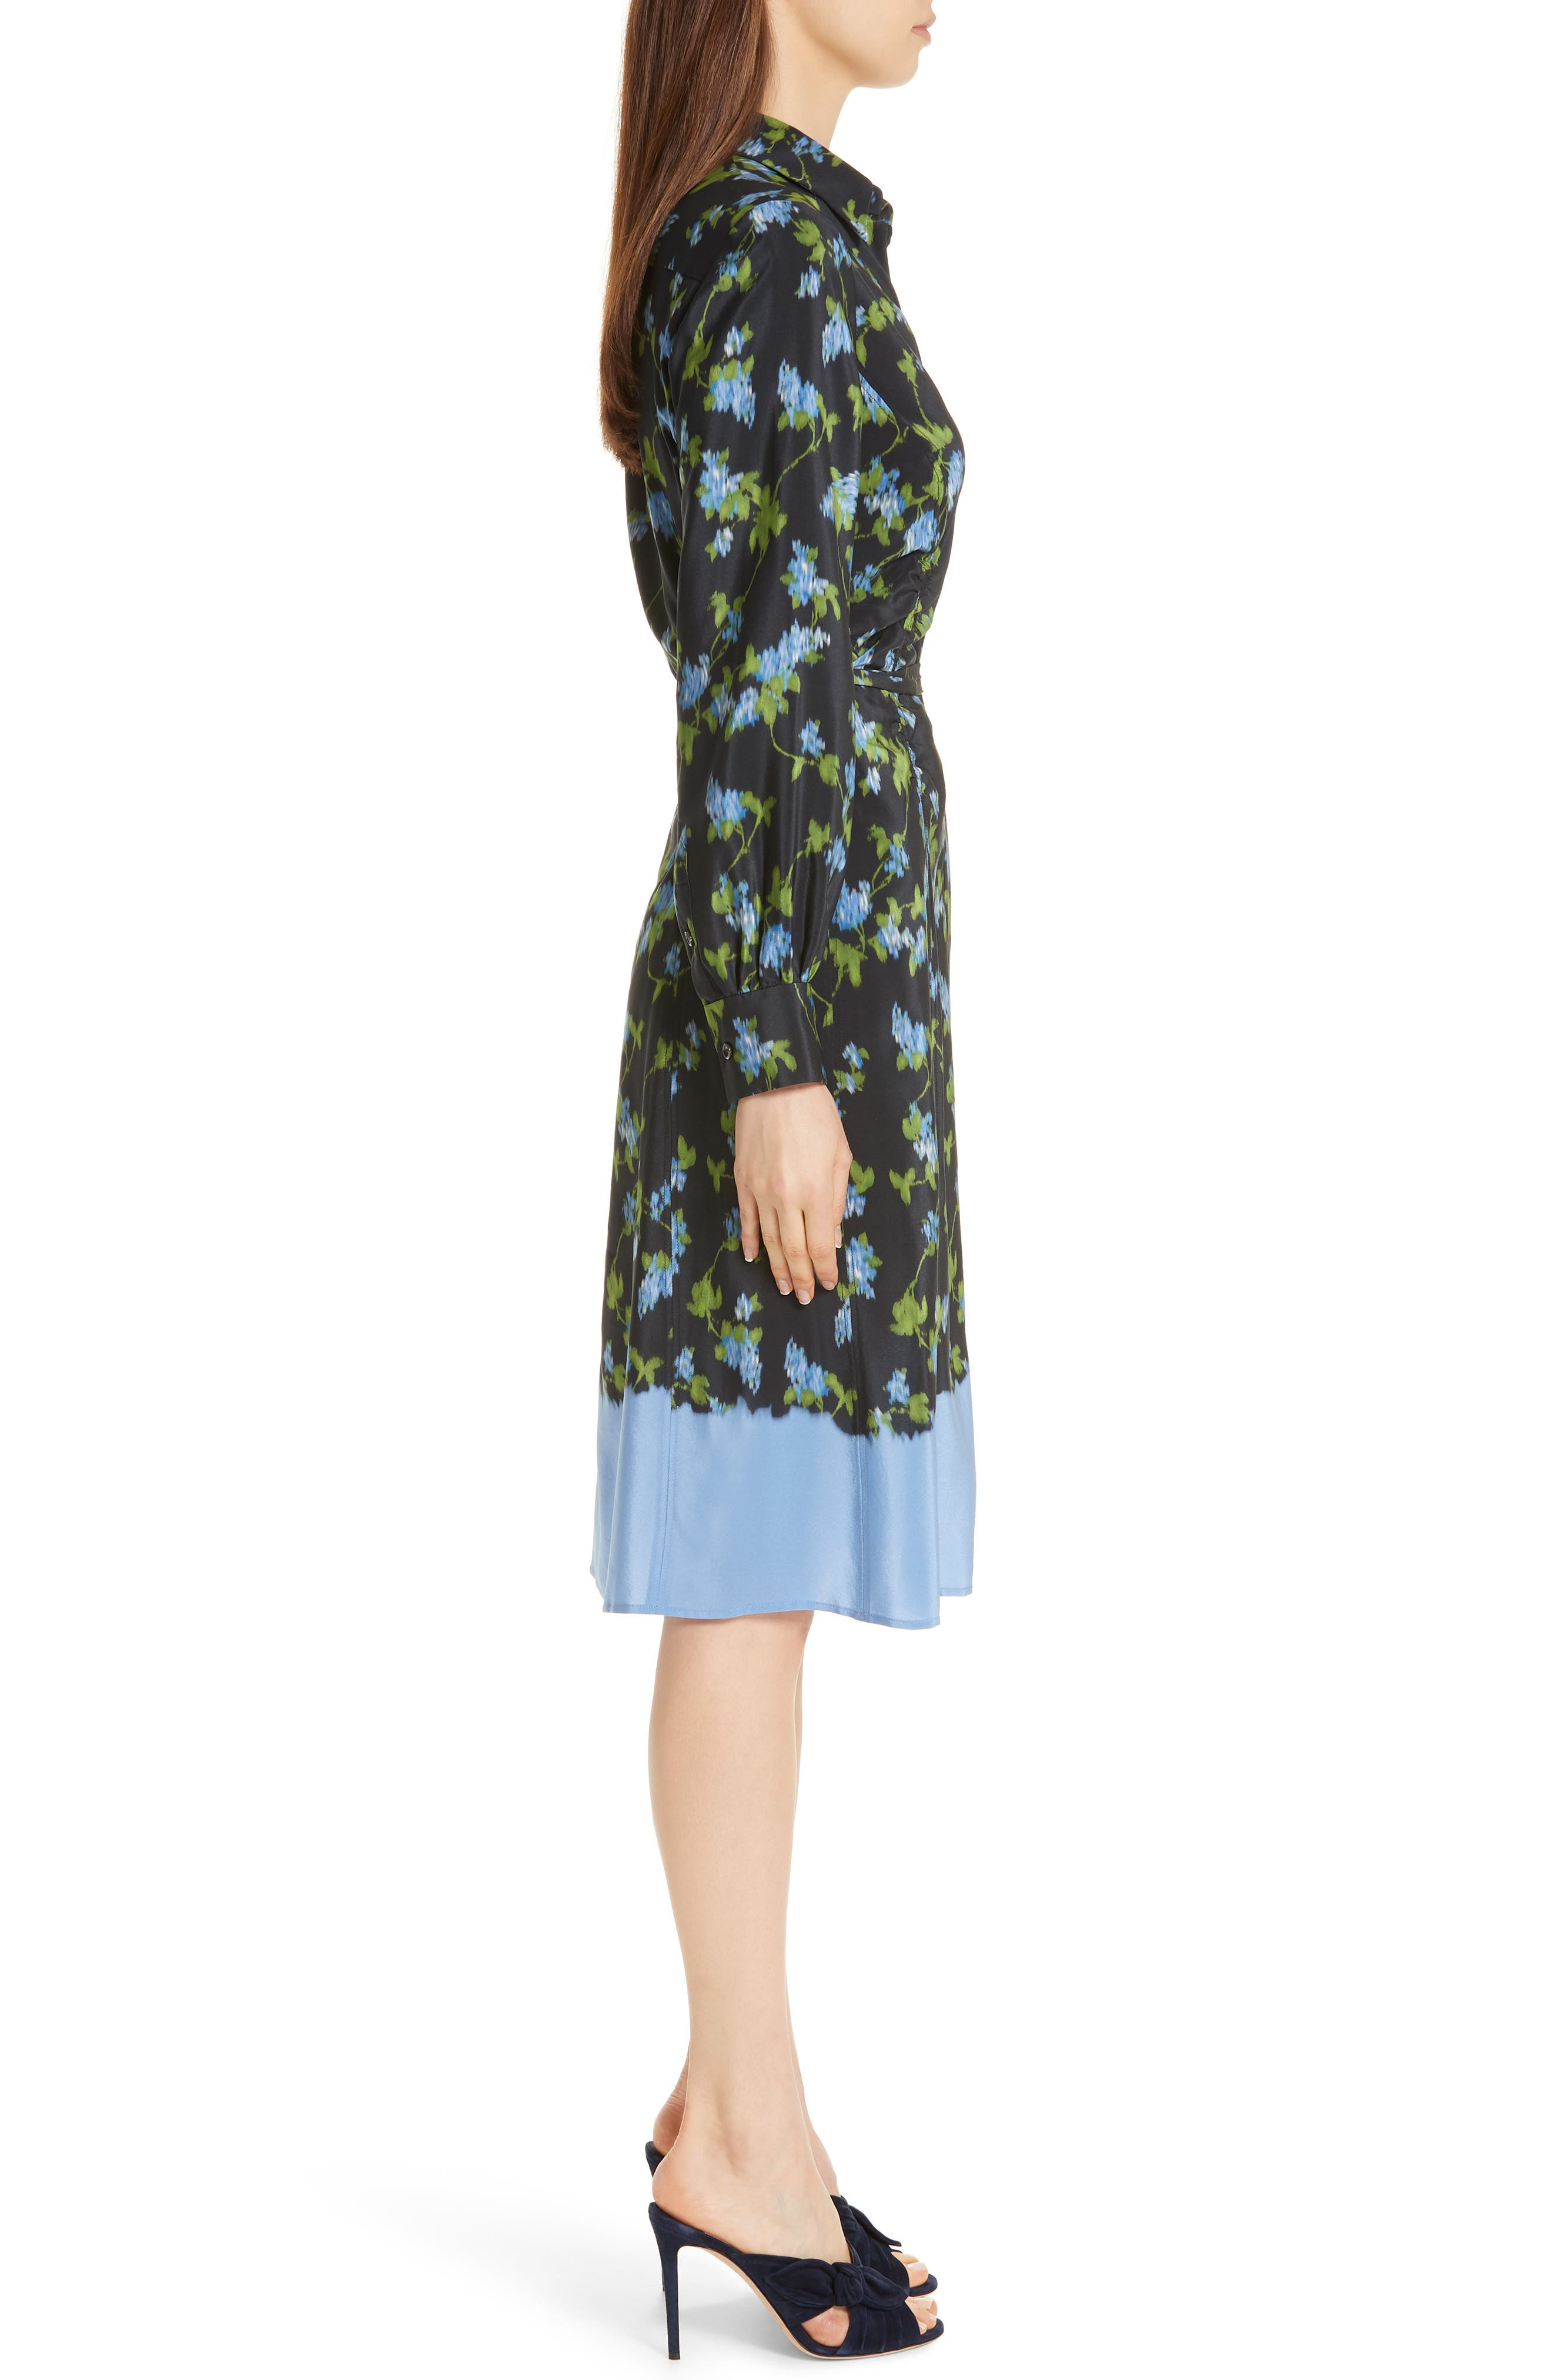 ALTUZARRA, Floral Print Silk Dress, Alternate thumbnail 4, color, BLACK